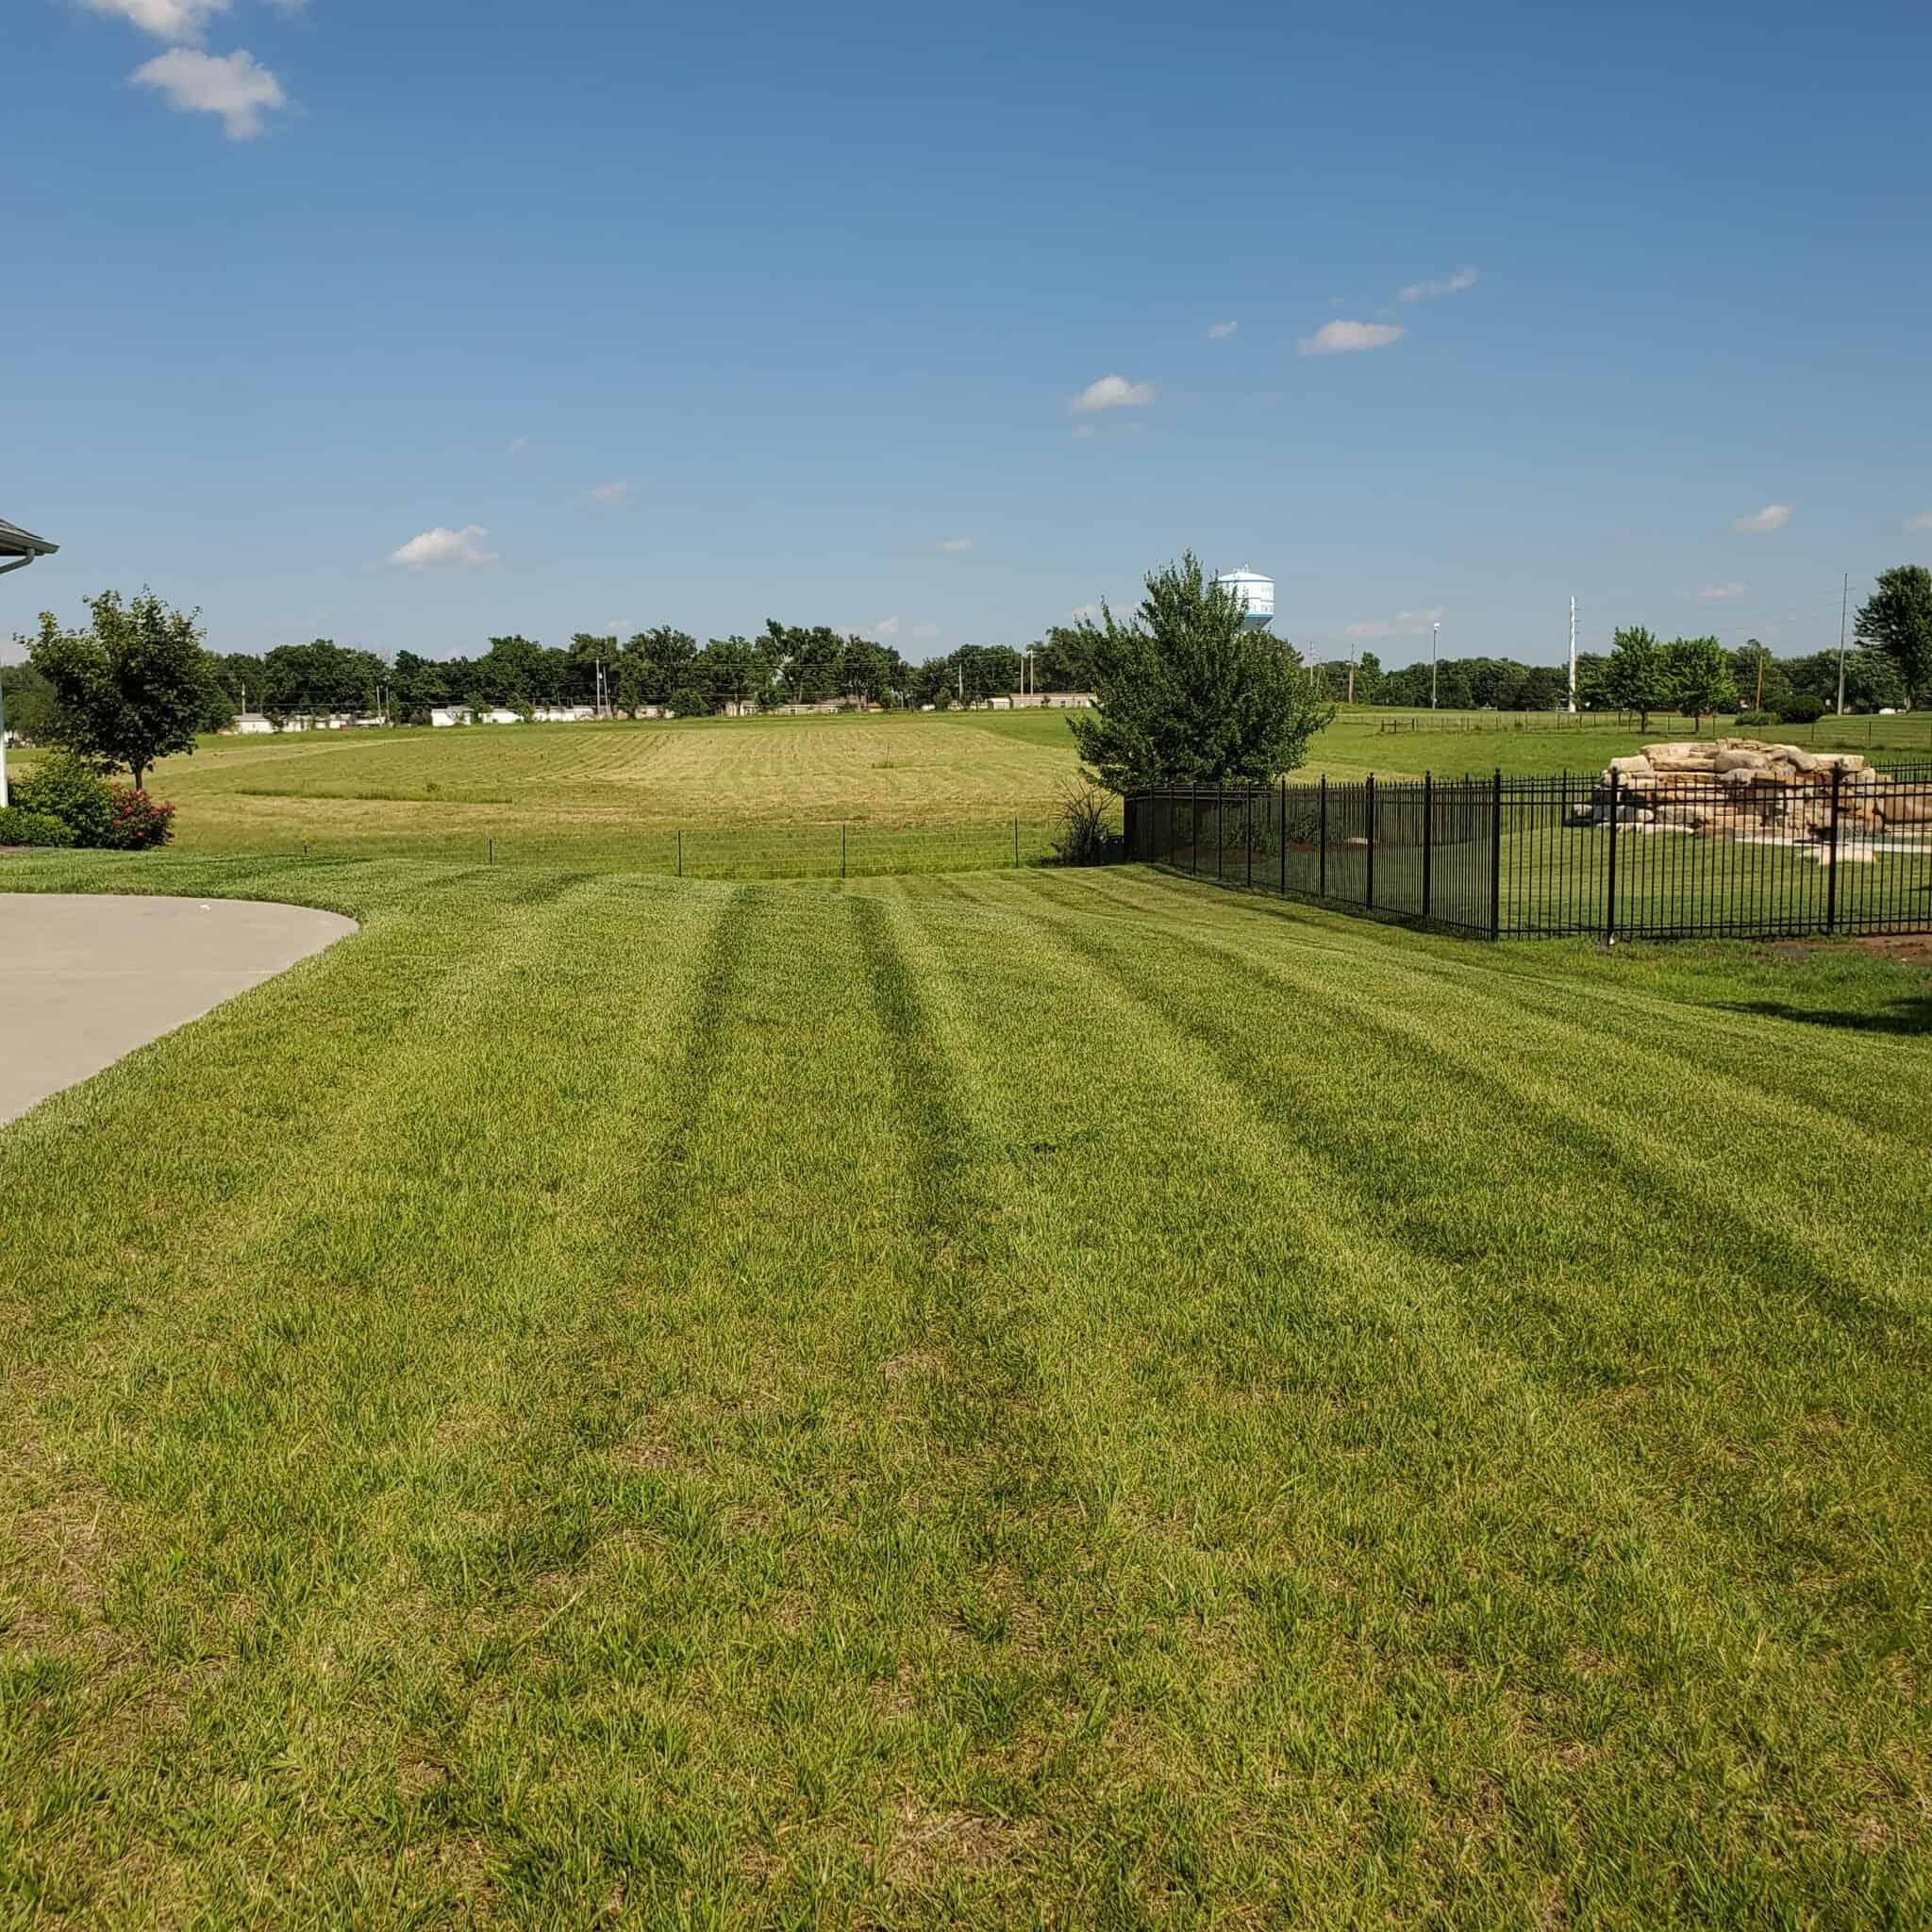 Lawn Maintenance in El Dorado, Augusta, Towanda KS and Surrounding Areas